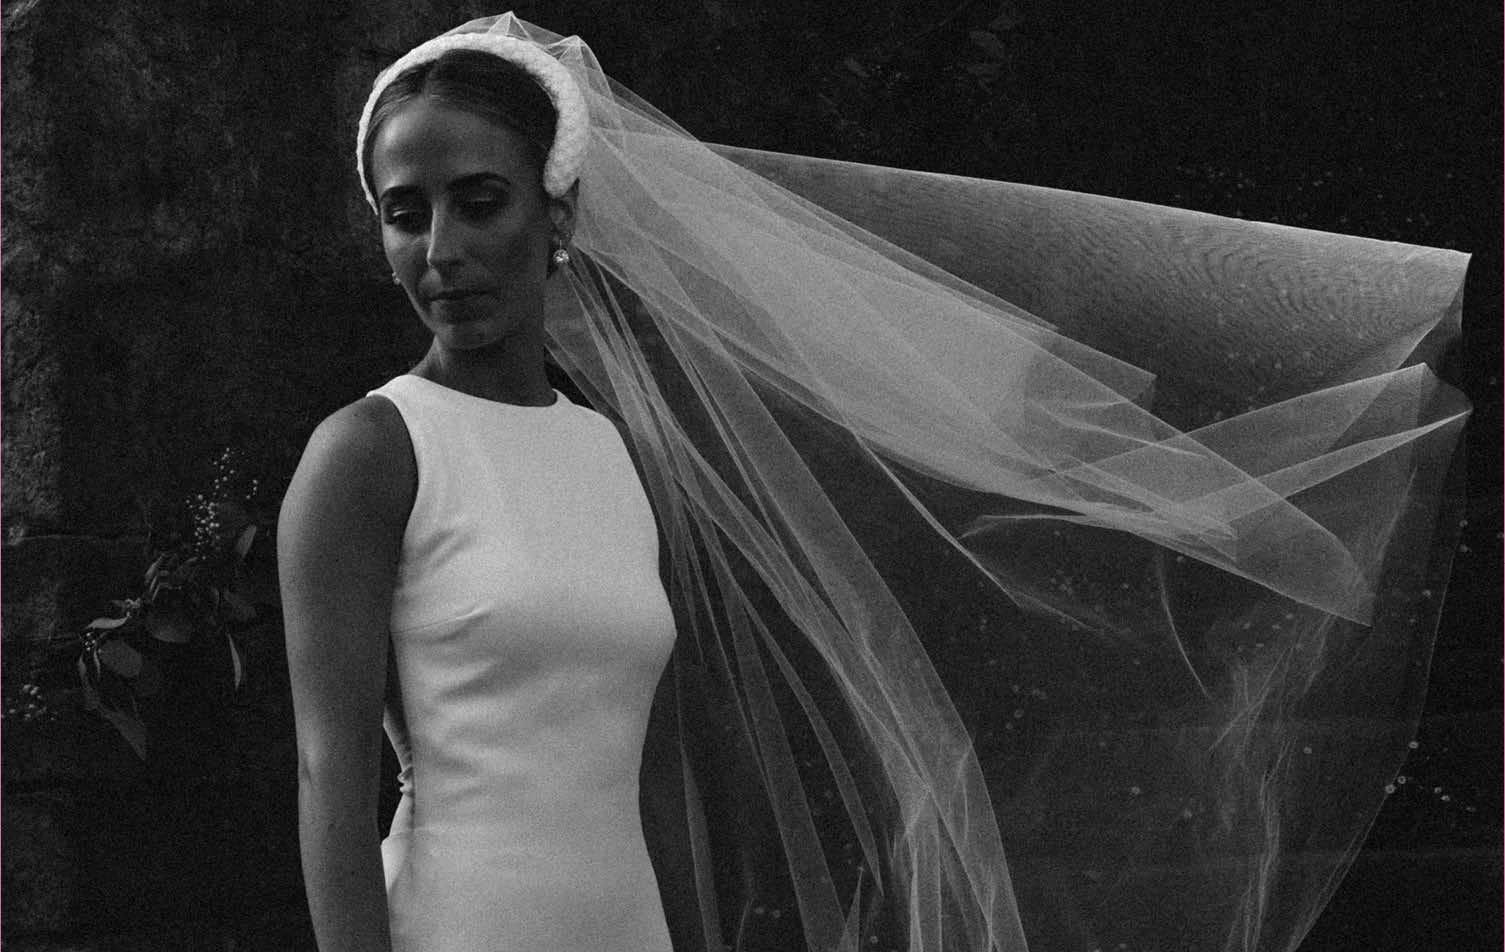 Pronovias Bride | Amaia & Iker